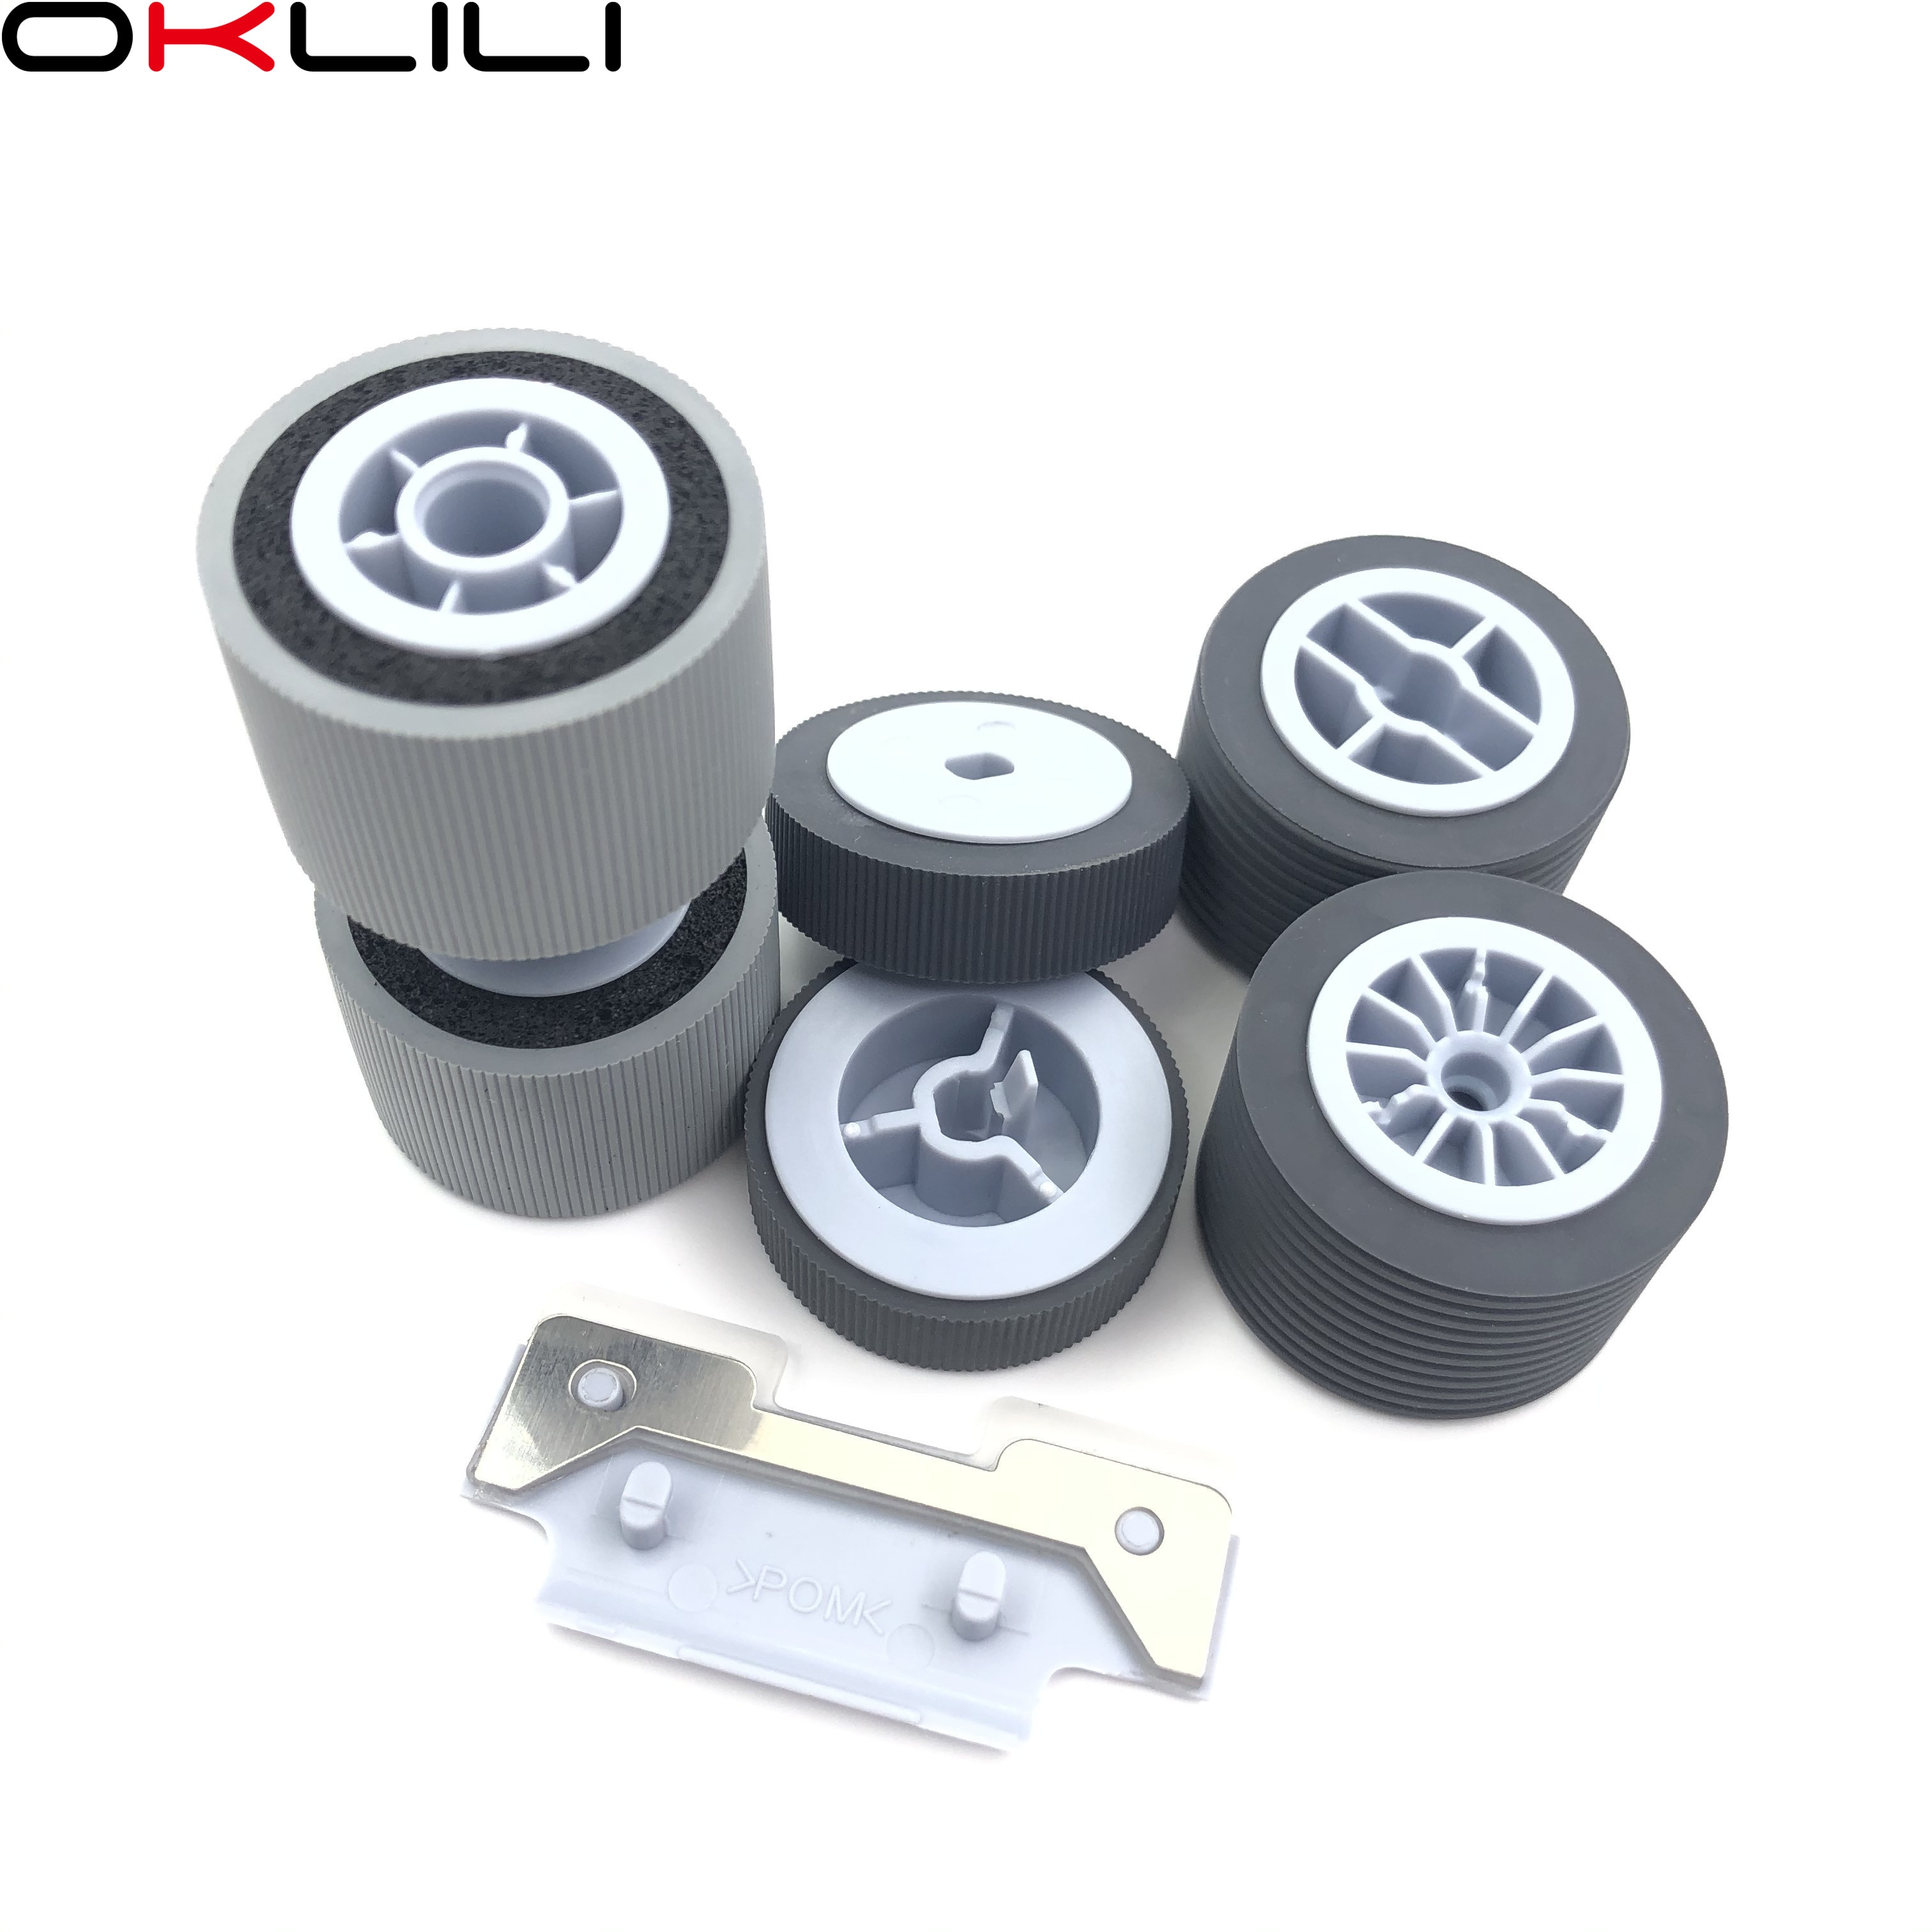 PA03450-K011 PA03450-K012 PA03450-K013 Pad Assy Pick Roller Bremse Separator Roller Roller für Fujitsu fi-5950 fi-5900C fi-5900